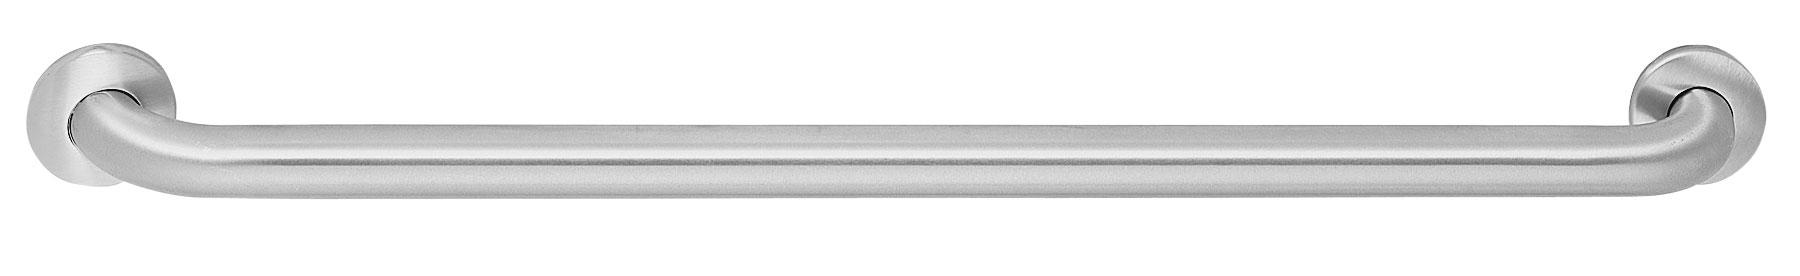 "Bradley 8122-001240 Peened Safety Grip Grab Bar 1-1/2"" OD x 24"""